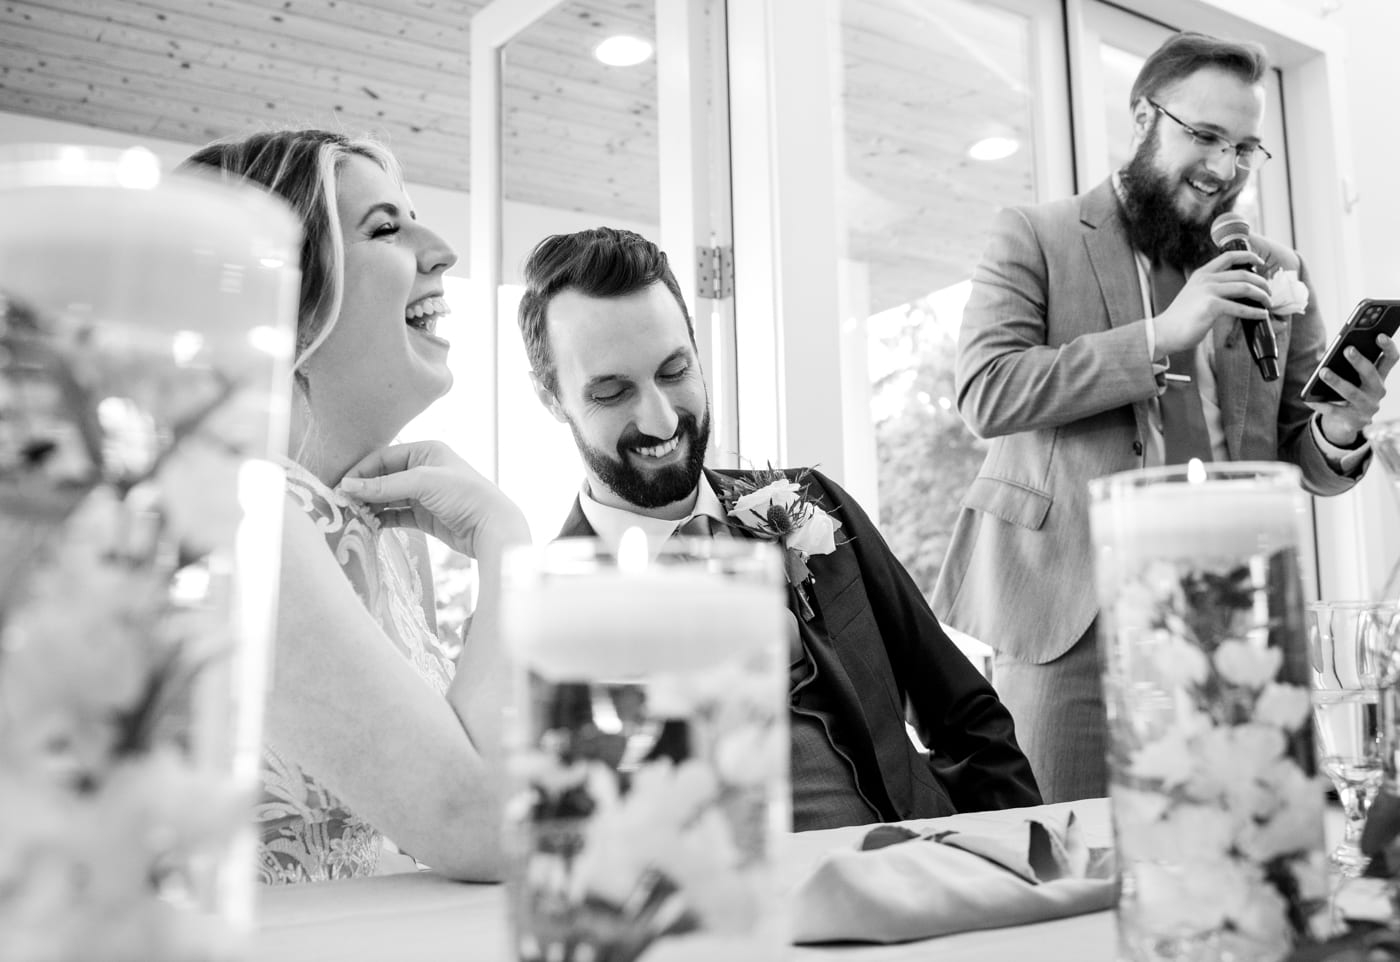 Wedding-Toasts-Trinity-Tree-Farm-Wedding-Photos-Greener-Visuals